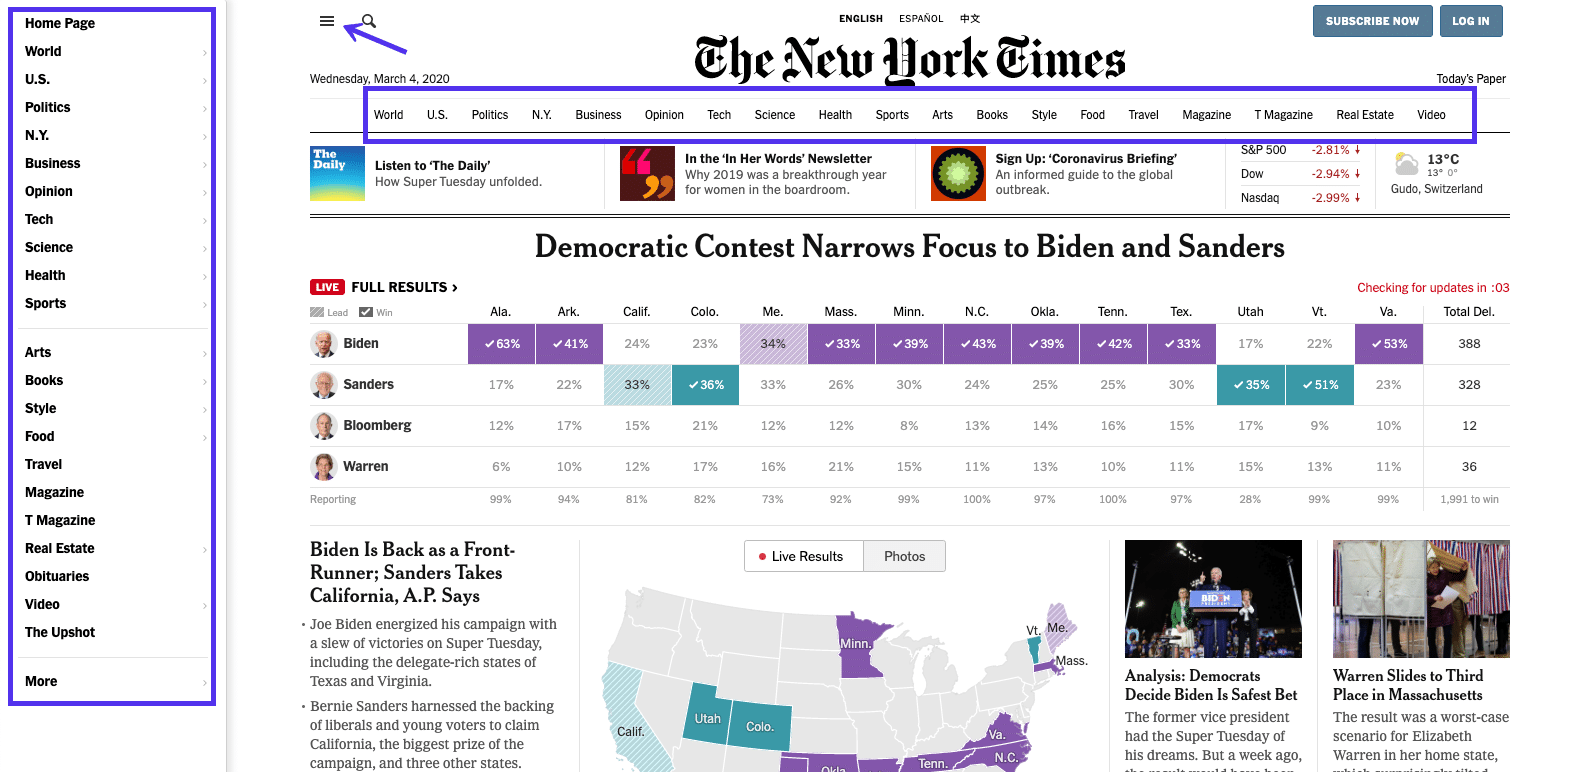 NYT homepage - headermenu's